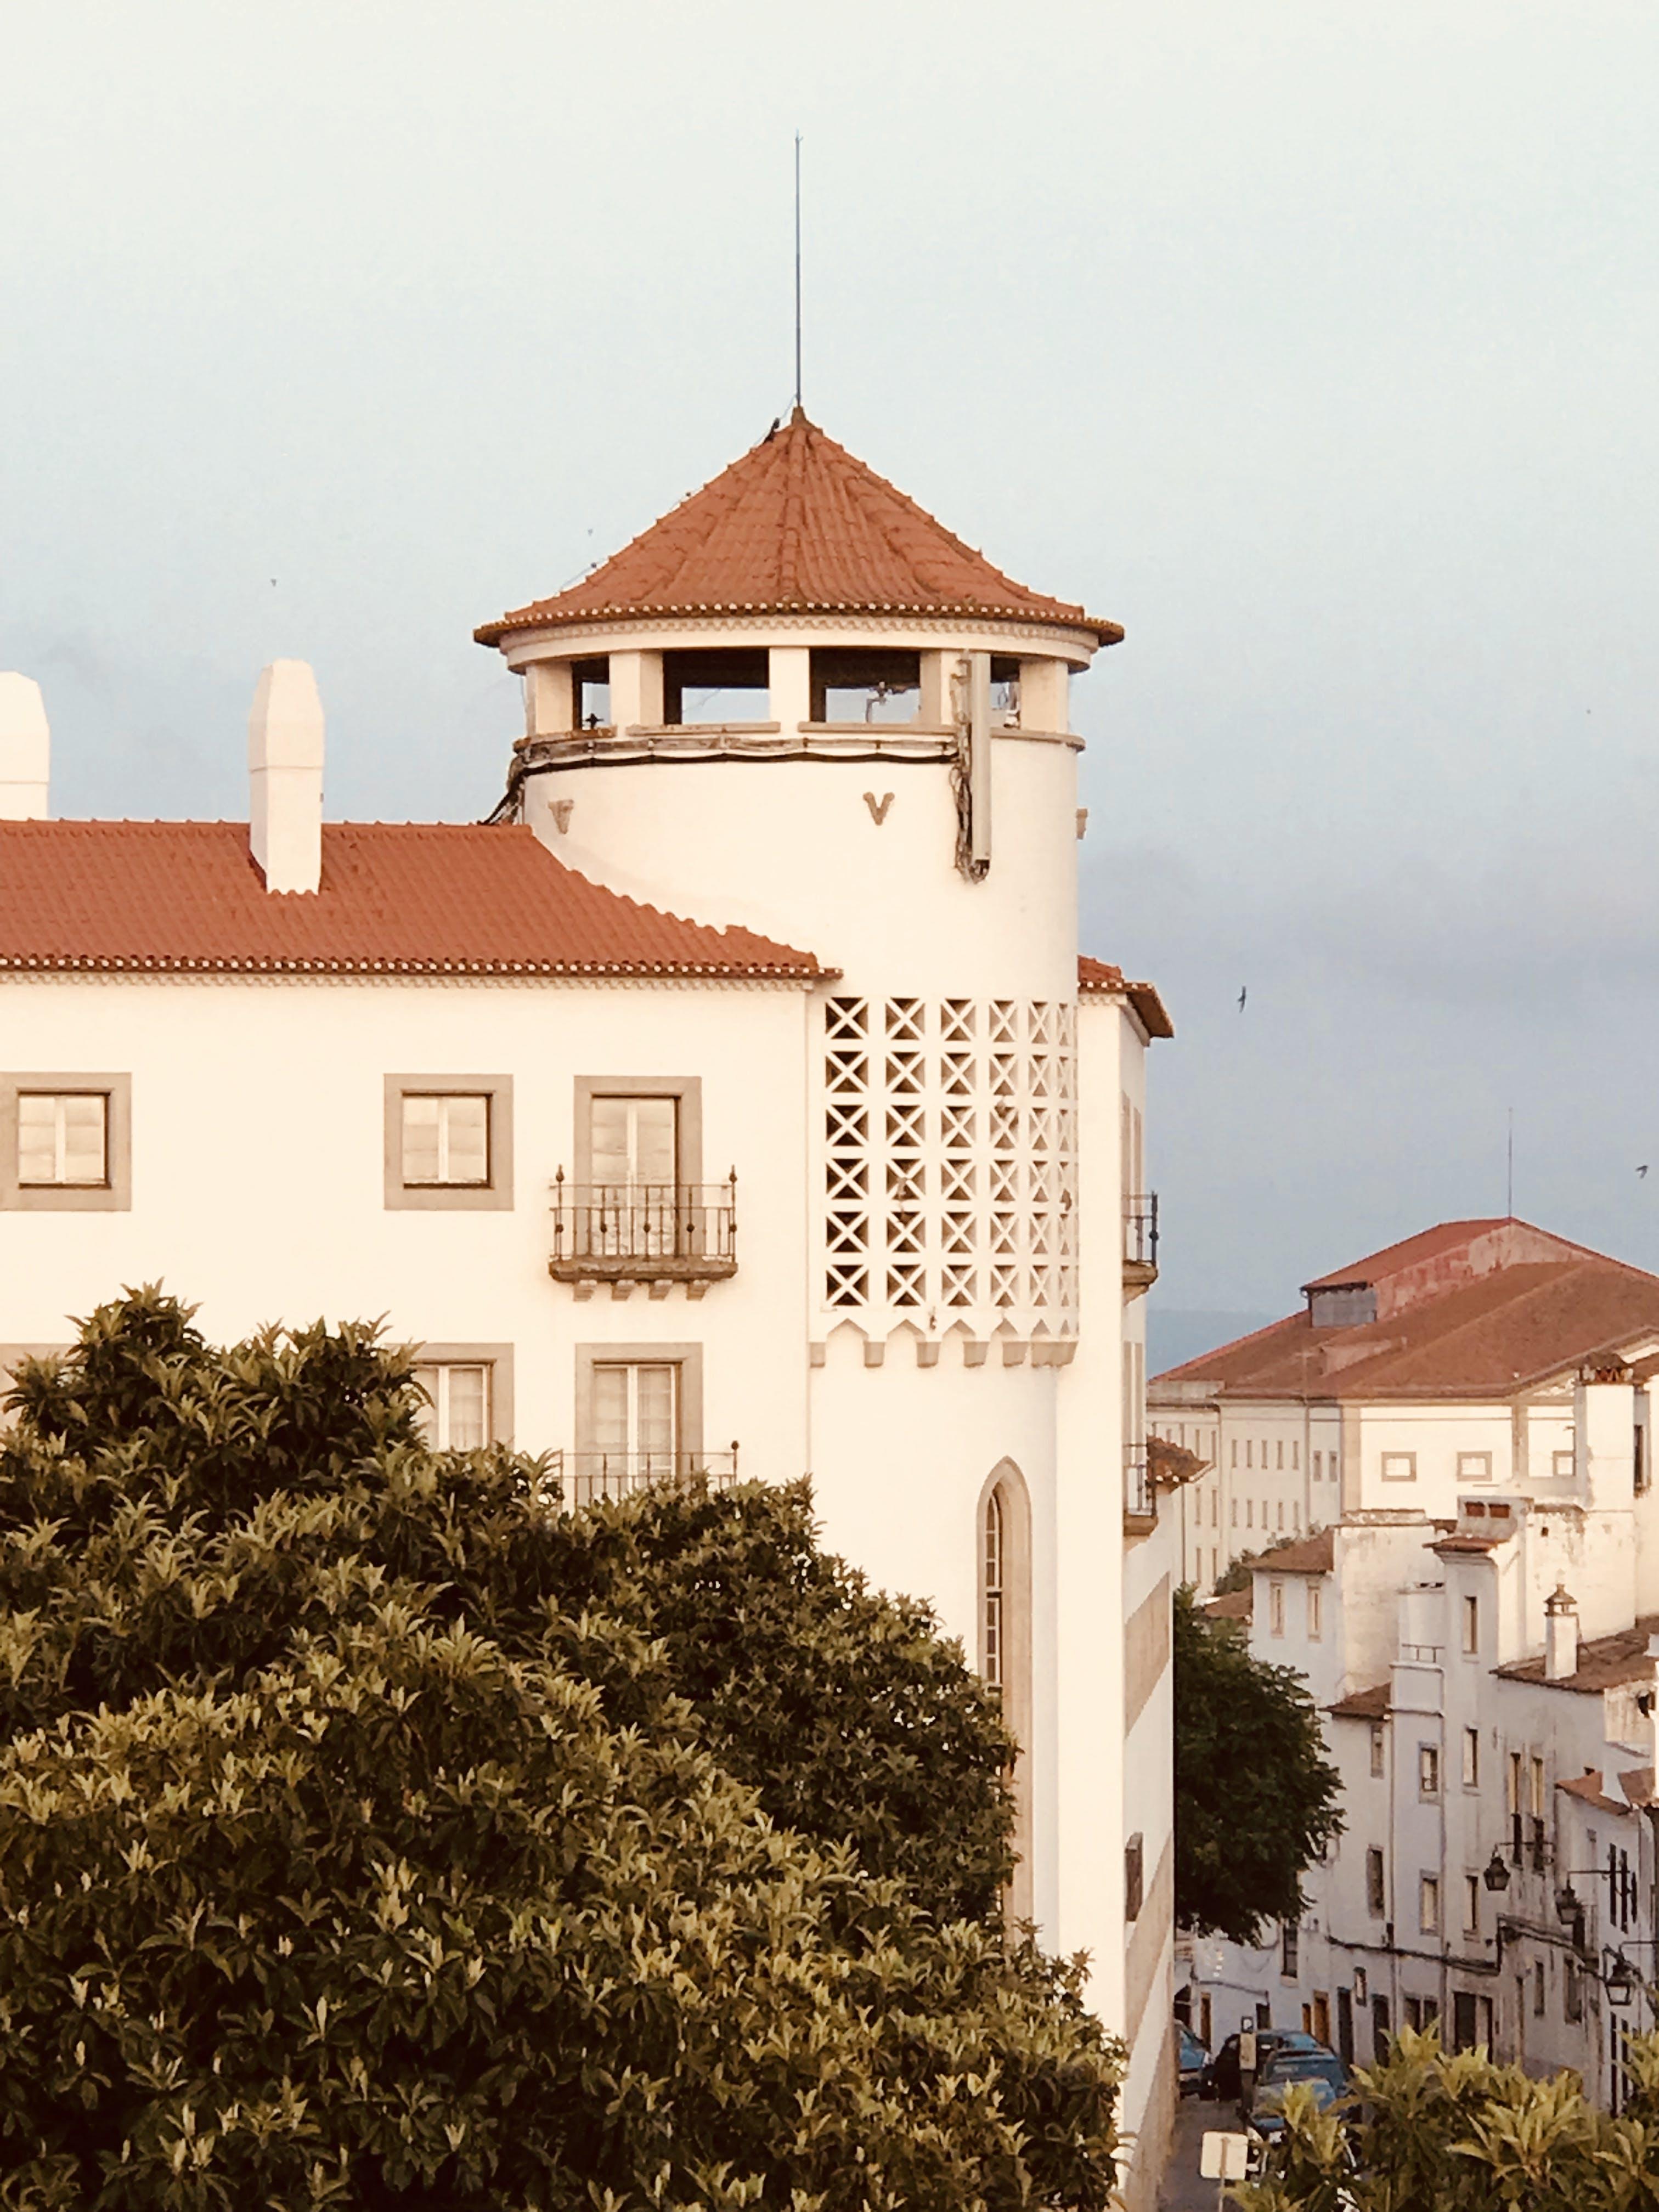 Free stock photo of Evora